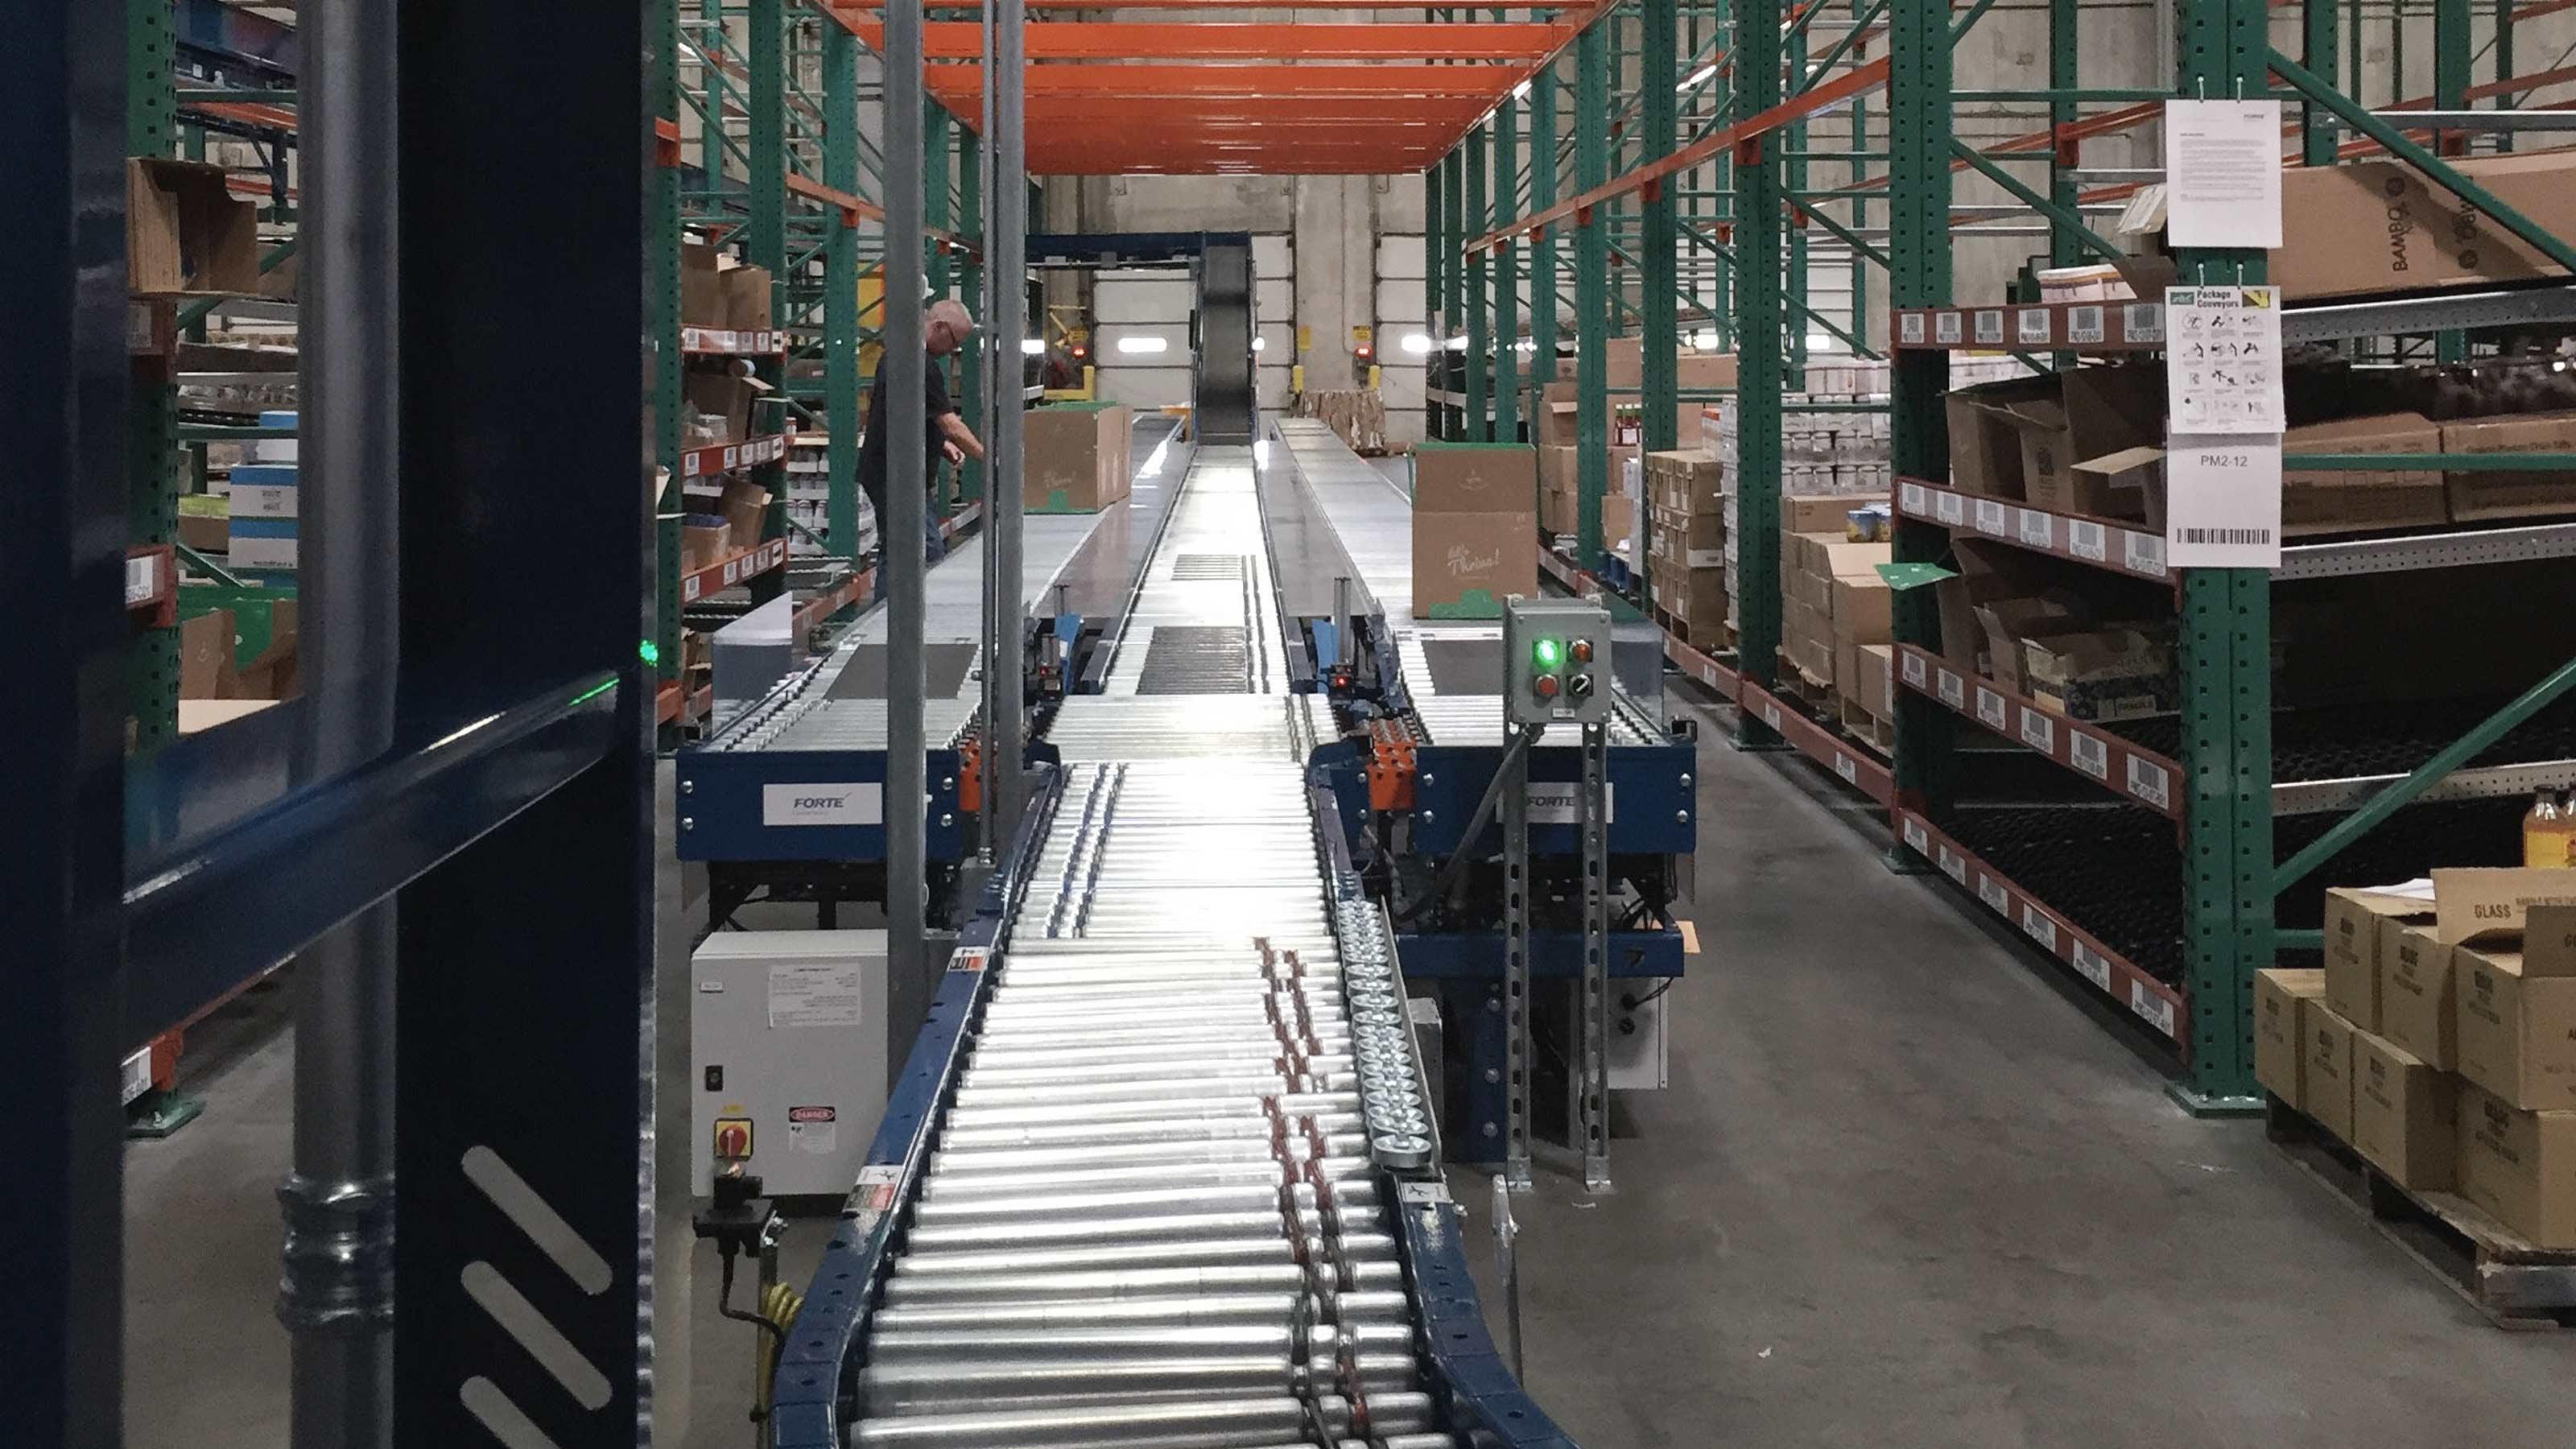 Thrive Market e-commerce distribution center | Swisslog